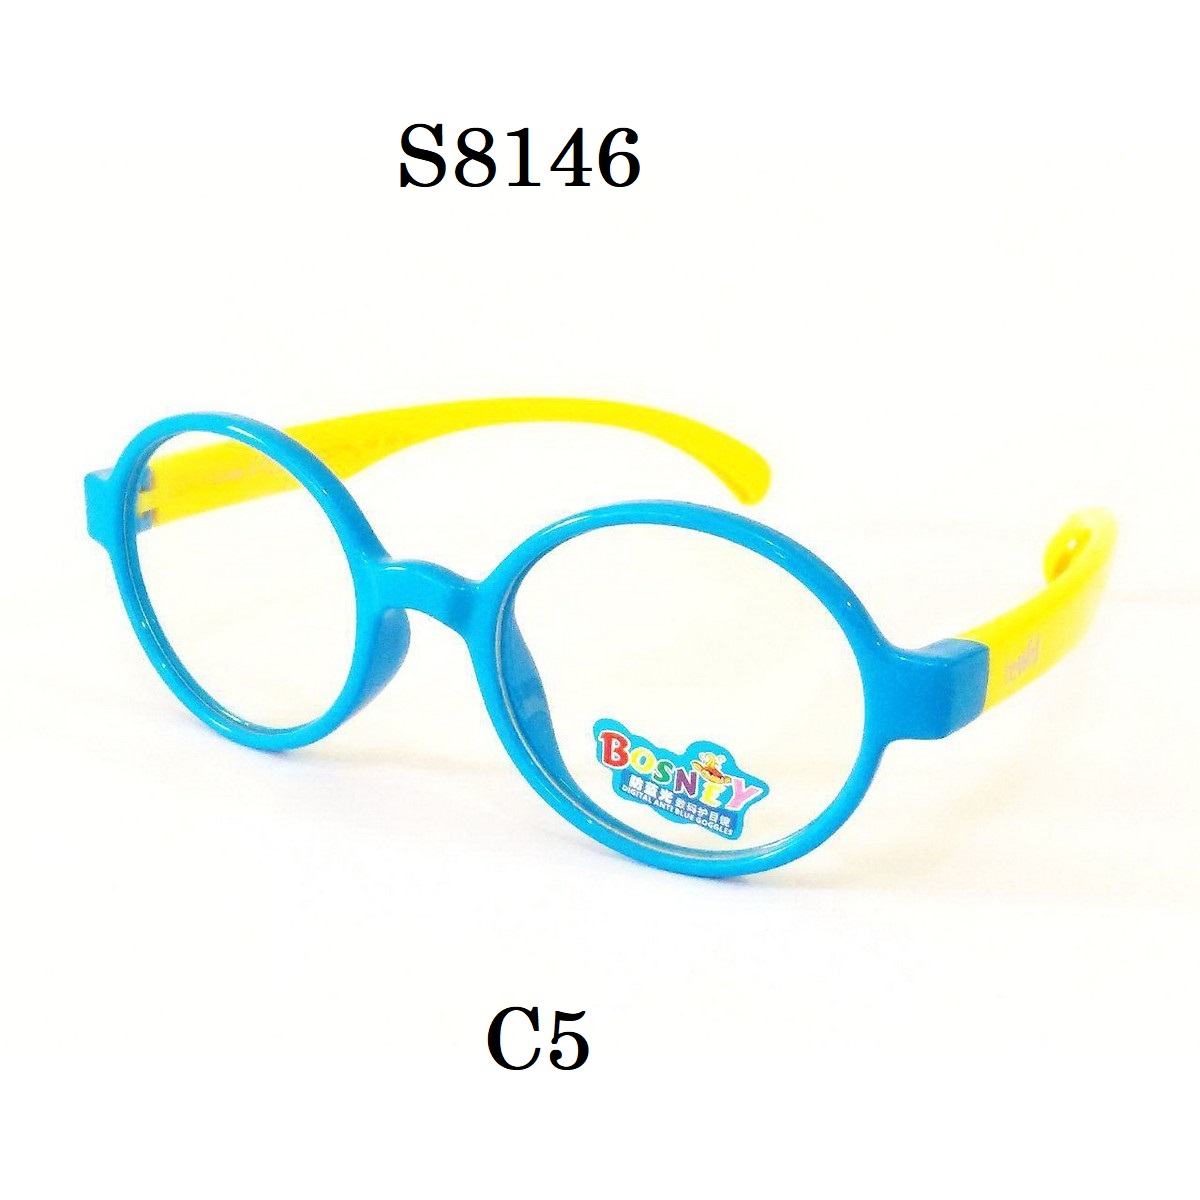 Kids Blue Light Blocker Computer Glasses Anti Blue Ray Eyeglasses S8146C5